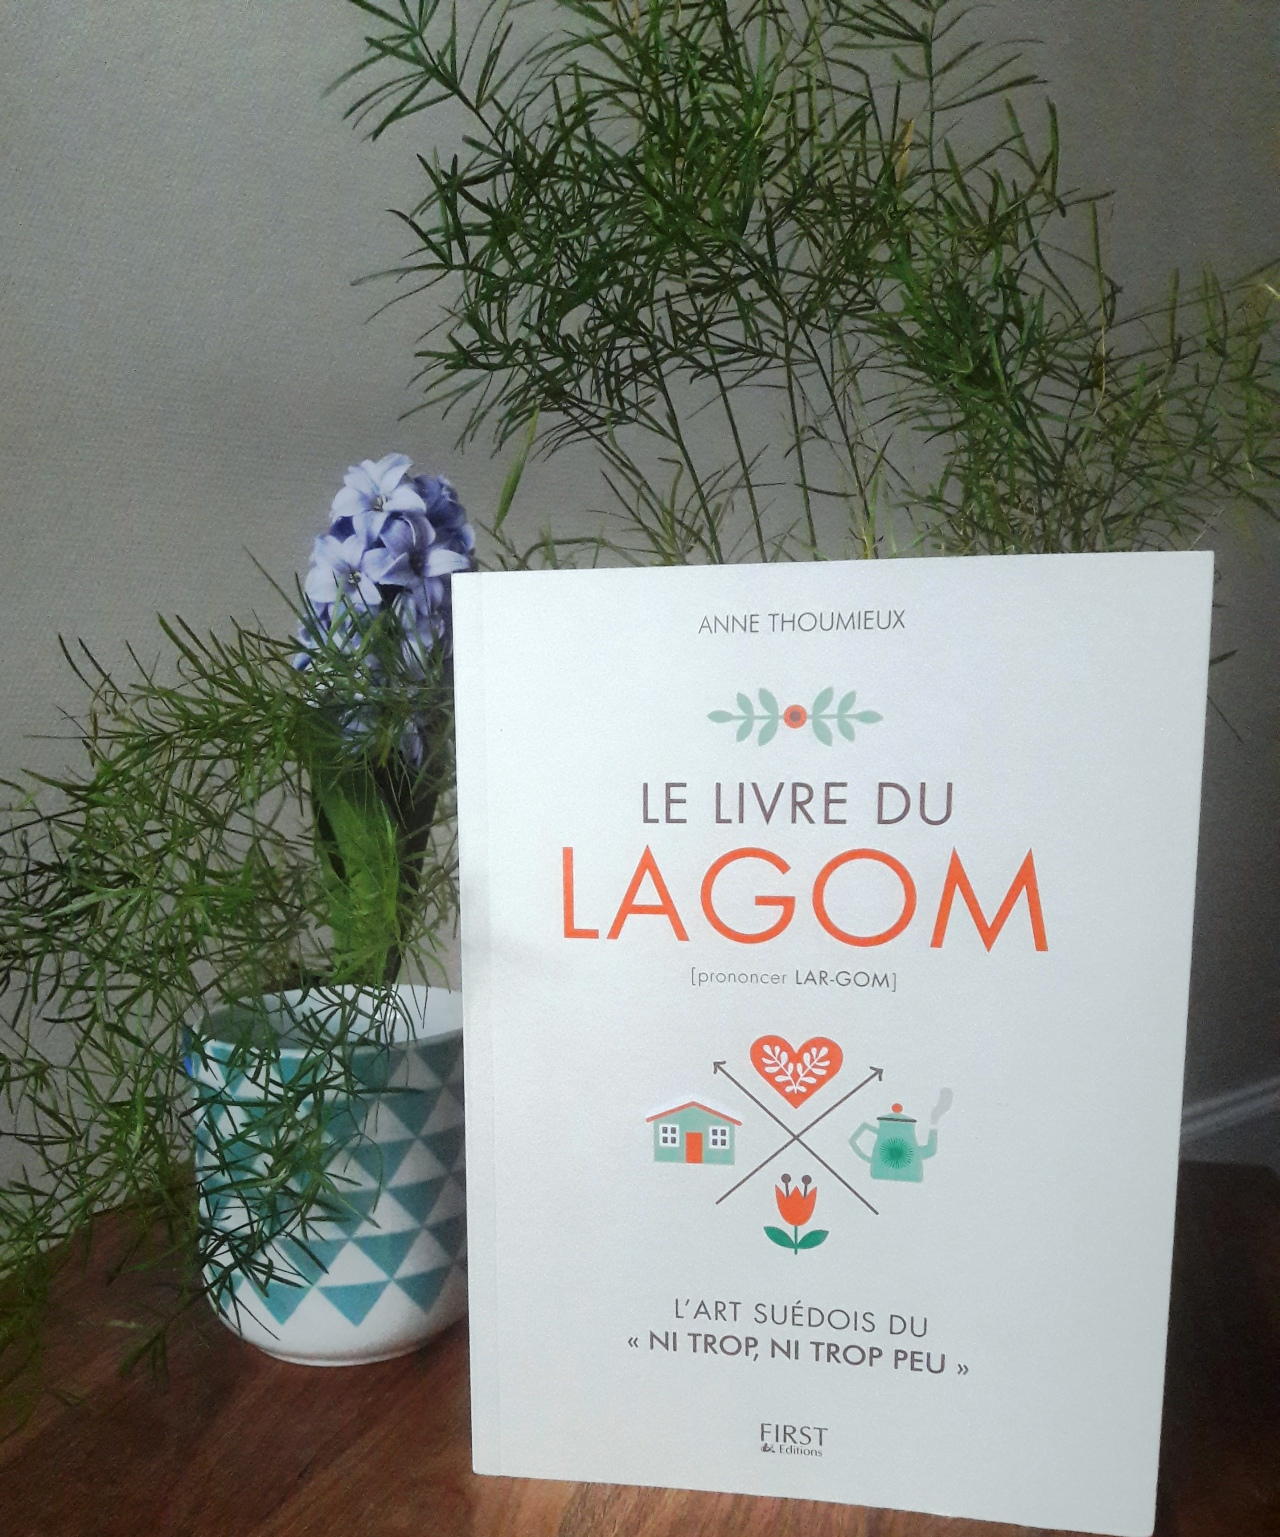 Mettre du Lagom dans sa vie!